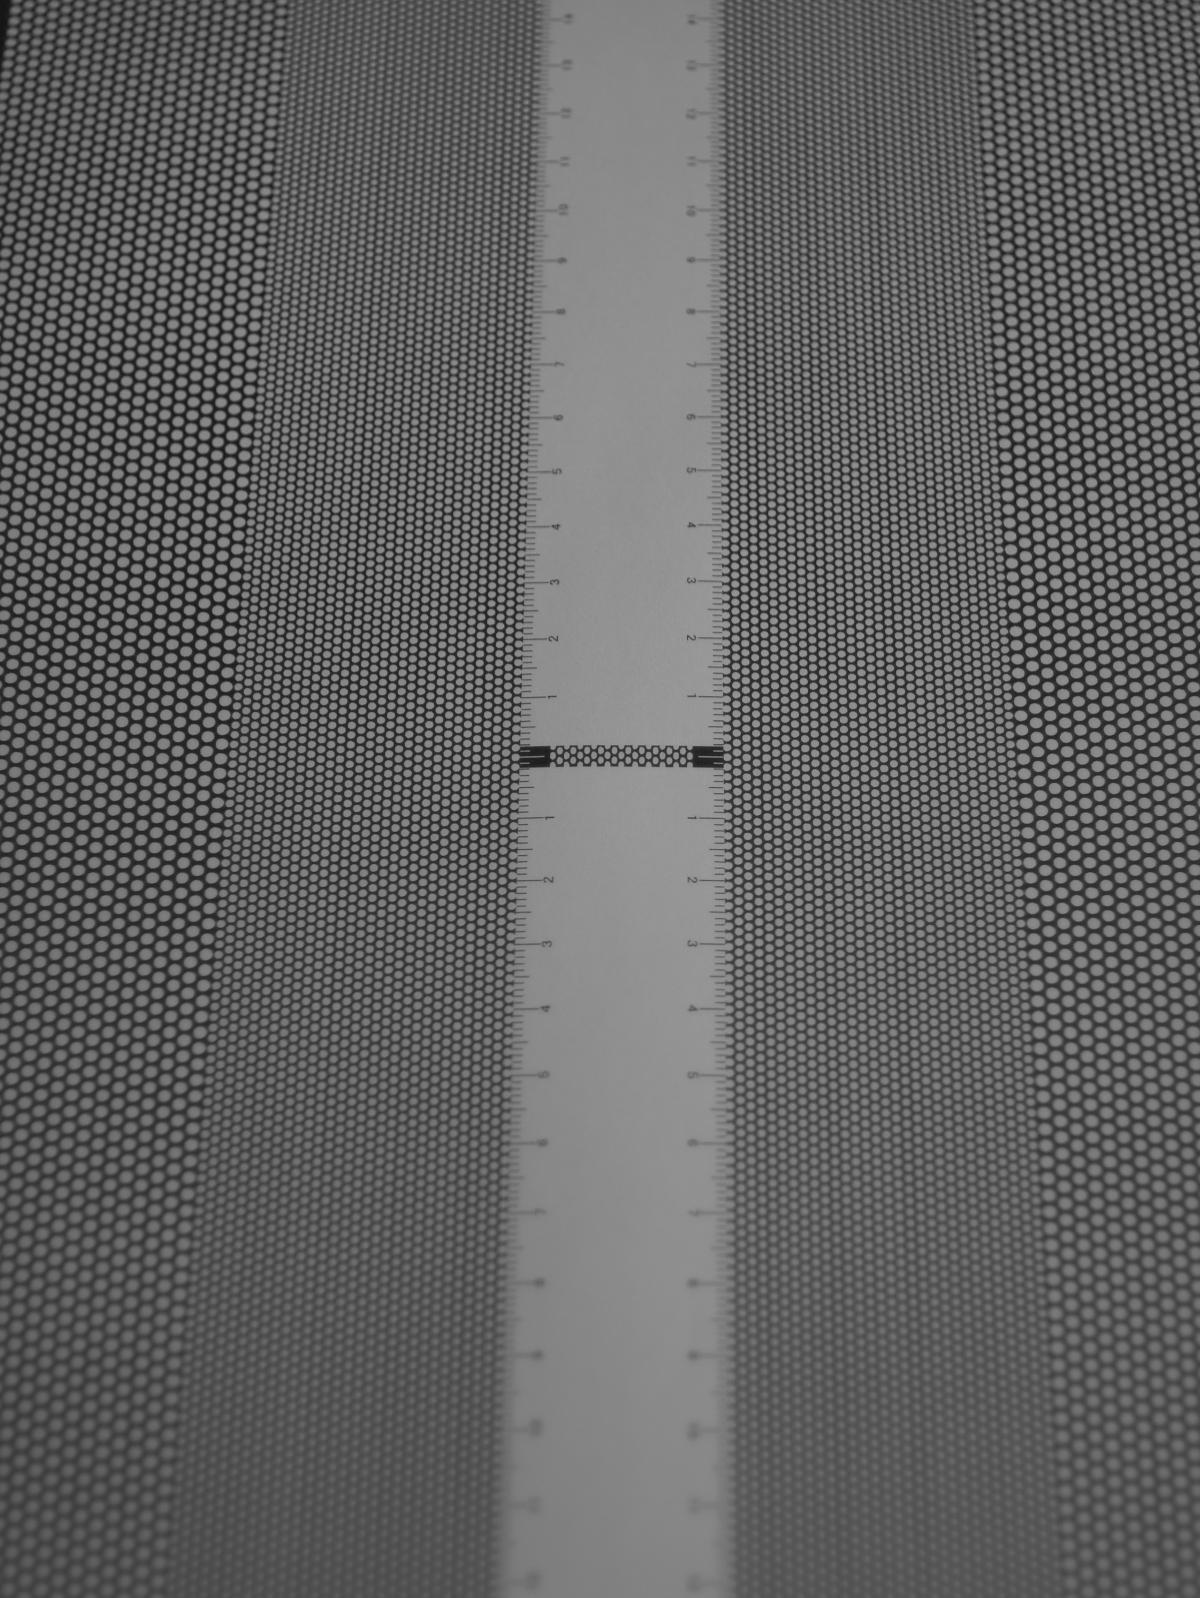 Flektogon 35mm F2.8 (中期型・ゼブラ模様) レンズ性能_b0161171_17125099.jpg